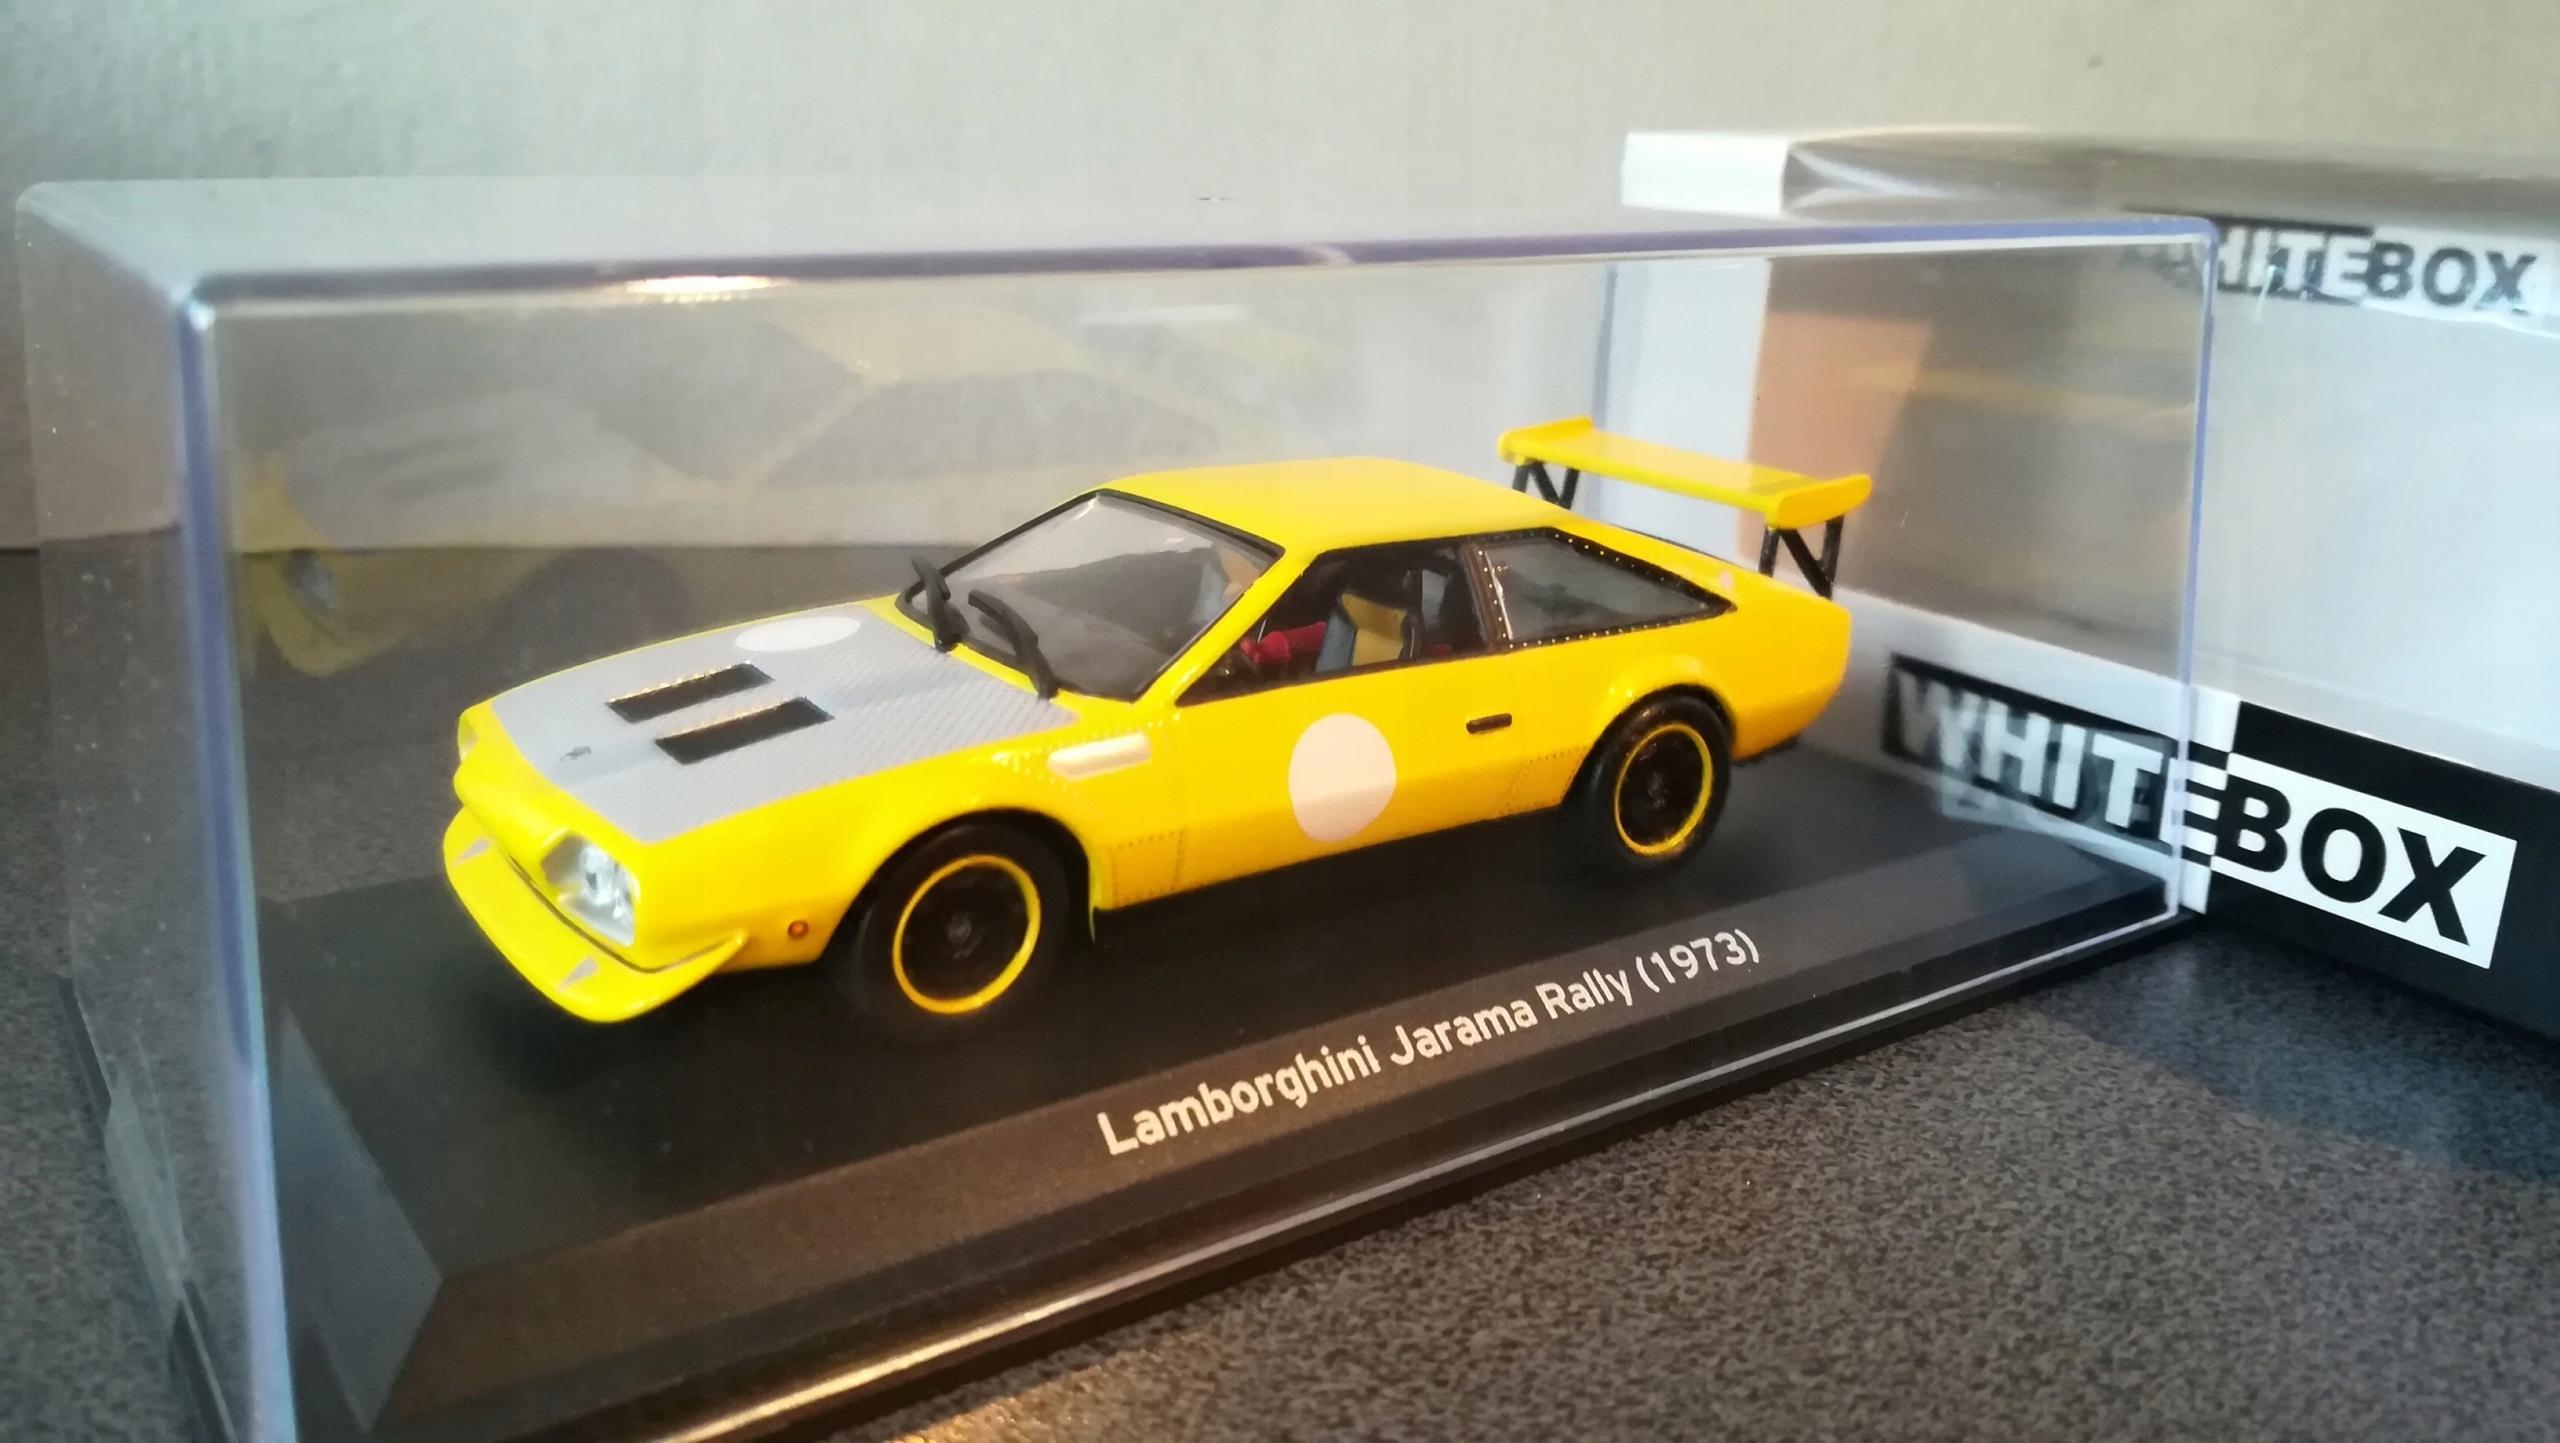 Lamborghini Jarama Rally 1 43 Whitebox 7598905212 Oficjalne